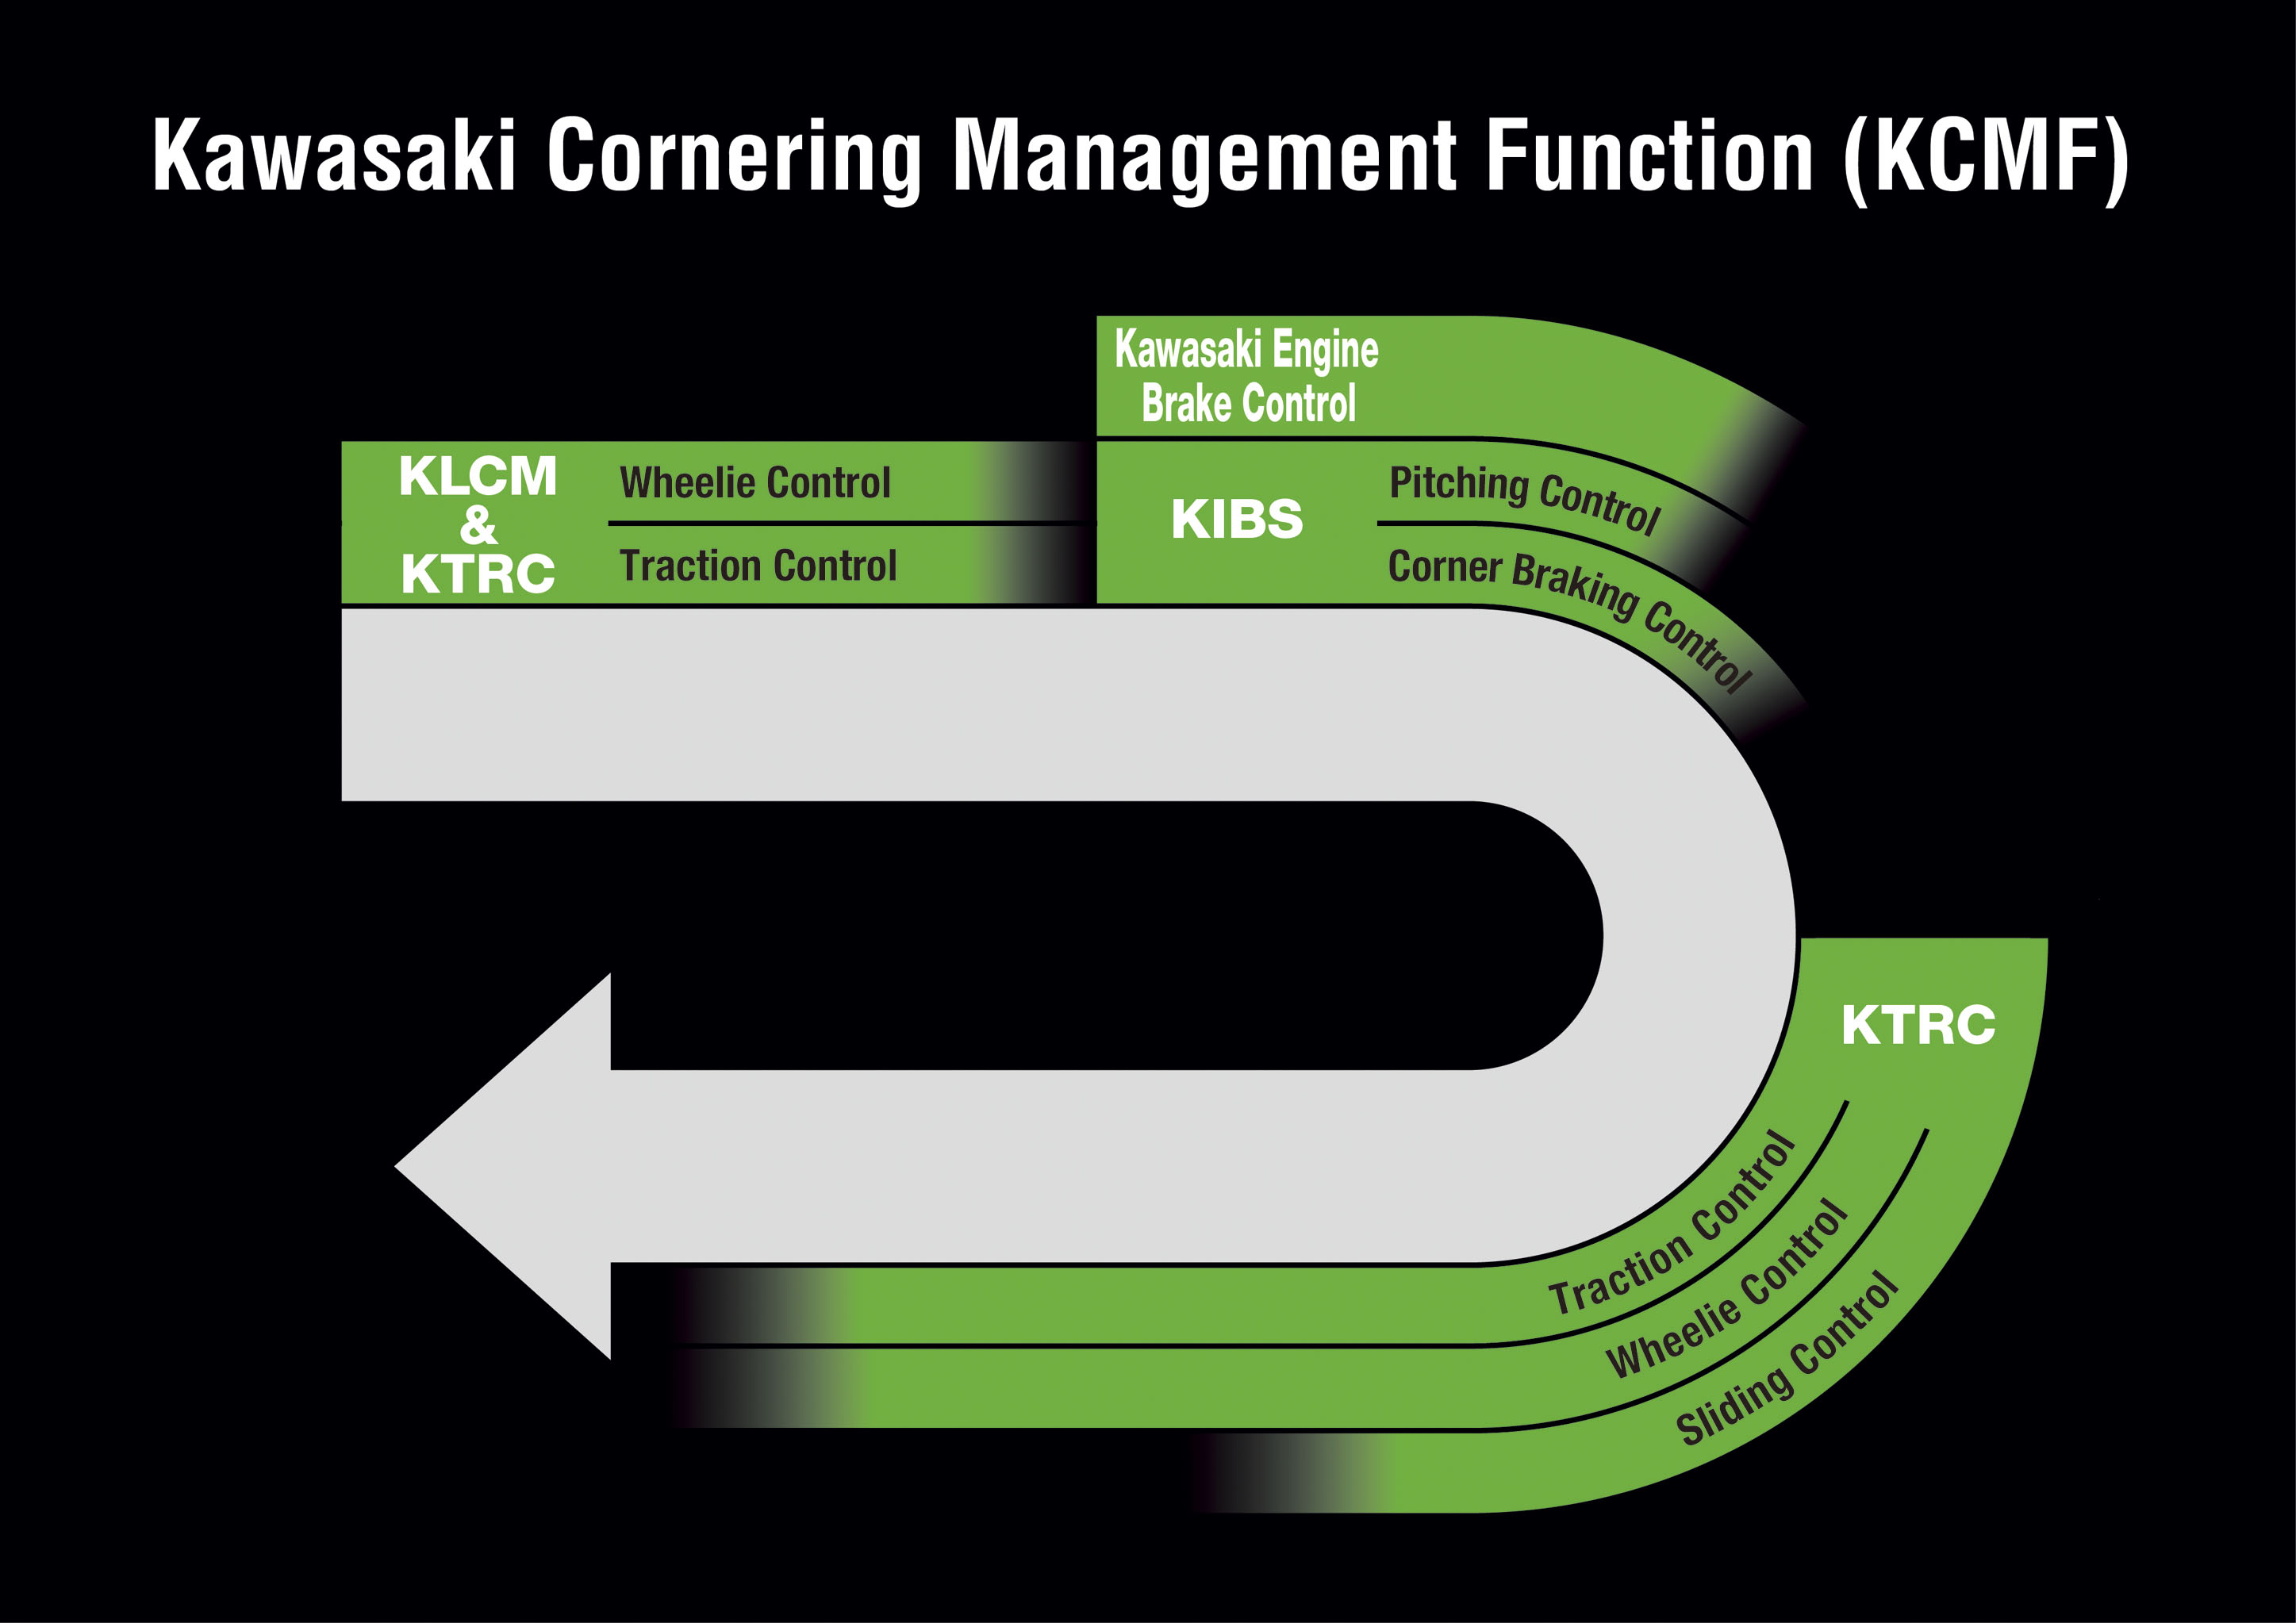 KCMF (Kawasaki Cornering Management Function)